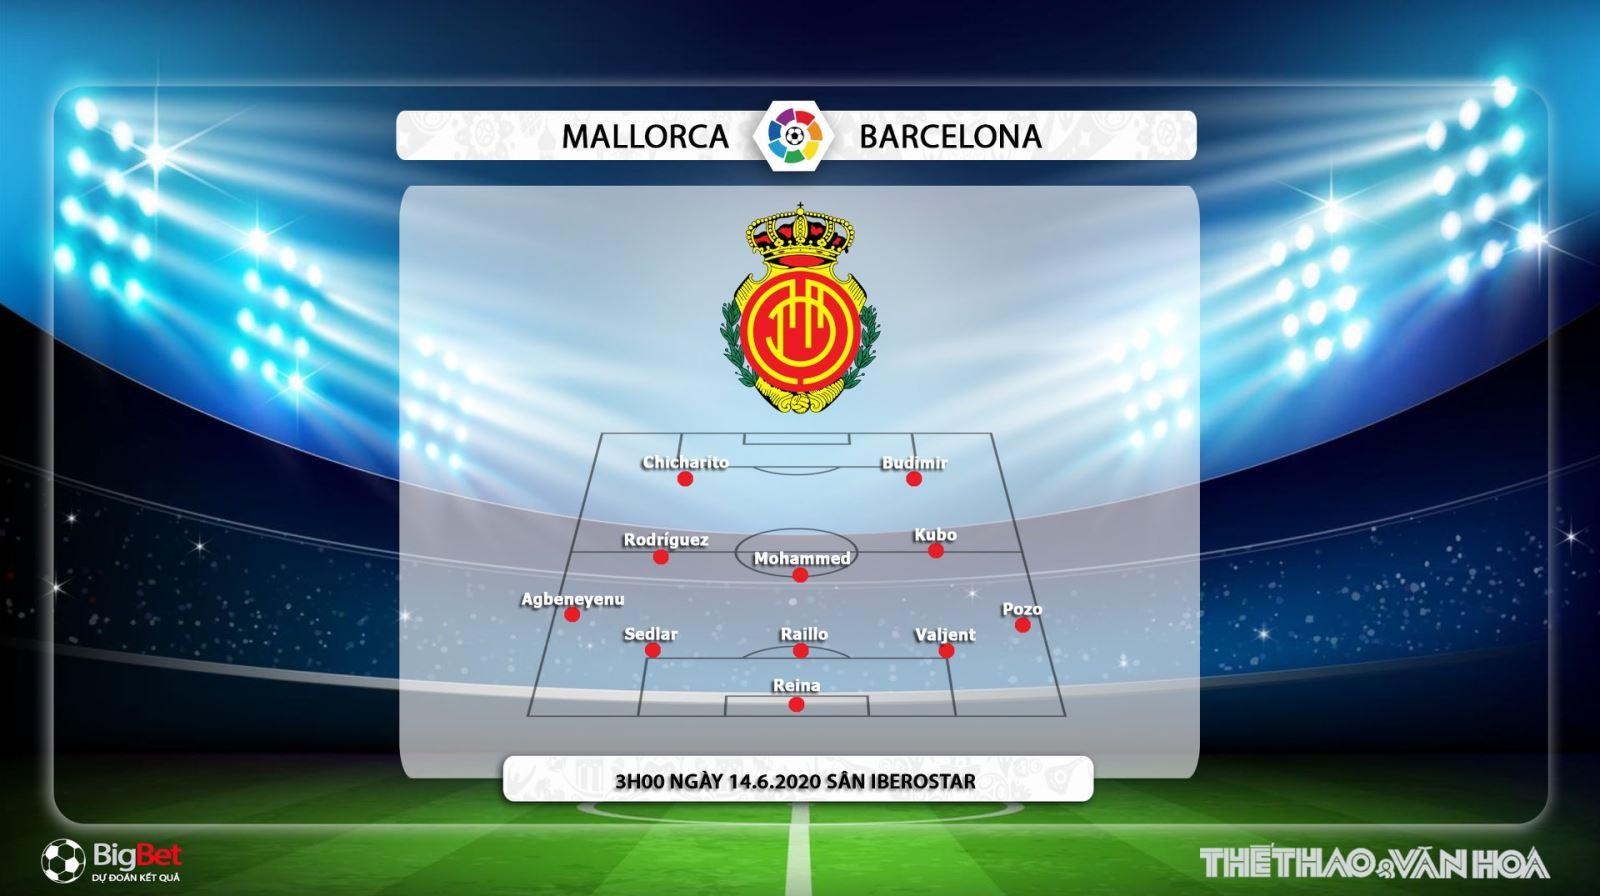 Mallorca vs Barcelona, soi kèo, nhận định, bóng đá, bong da, bong da hom nay, Mallorca, Barcelona